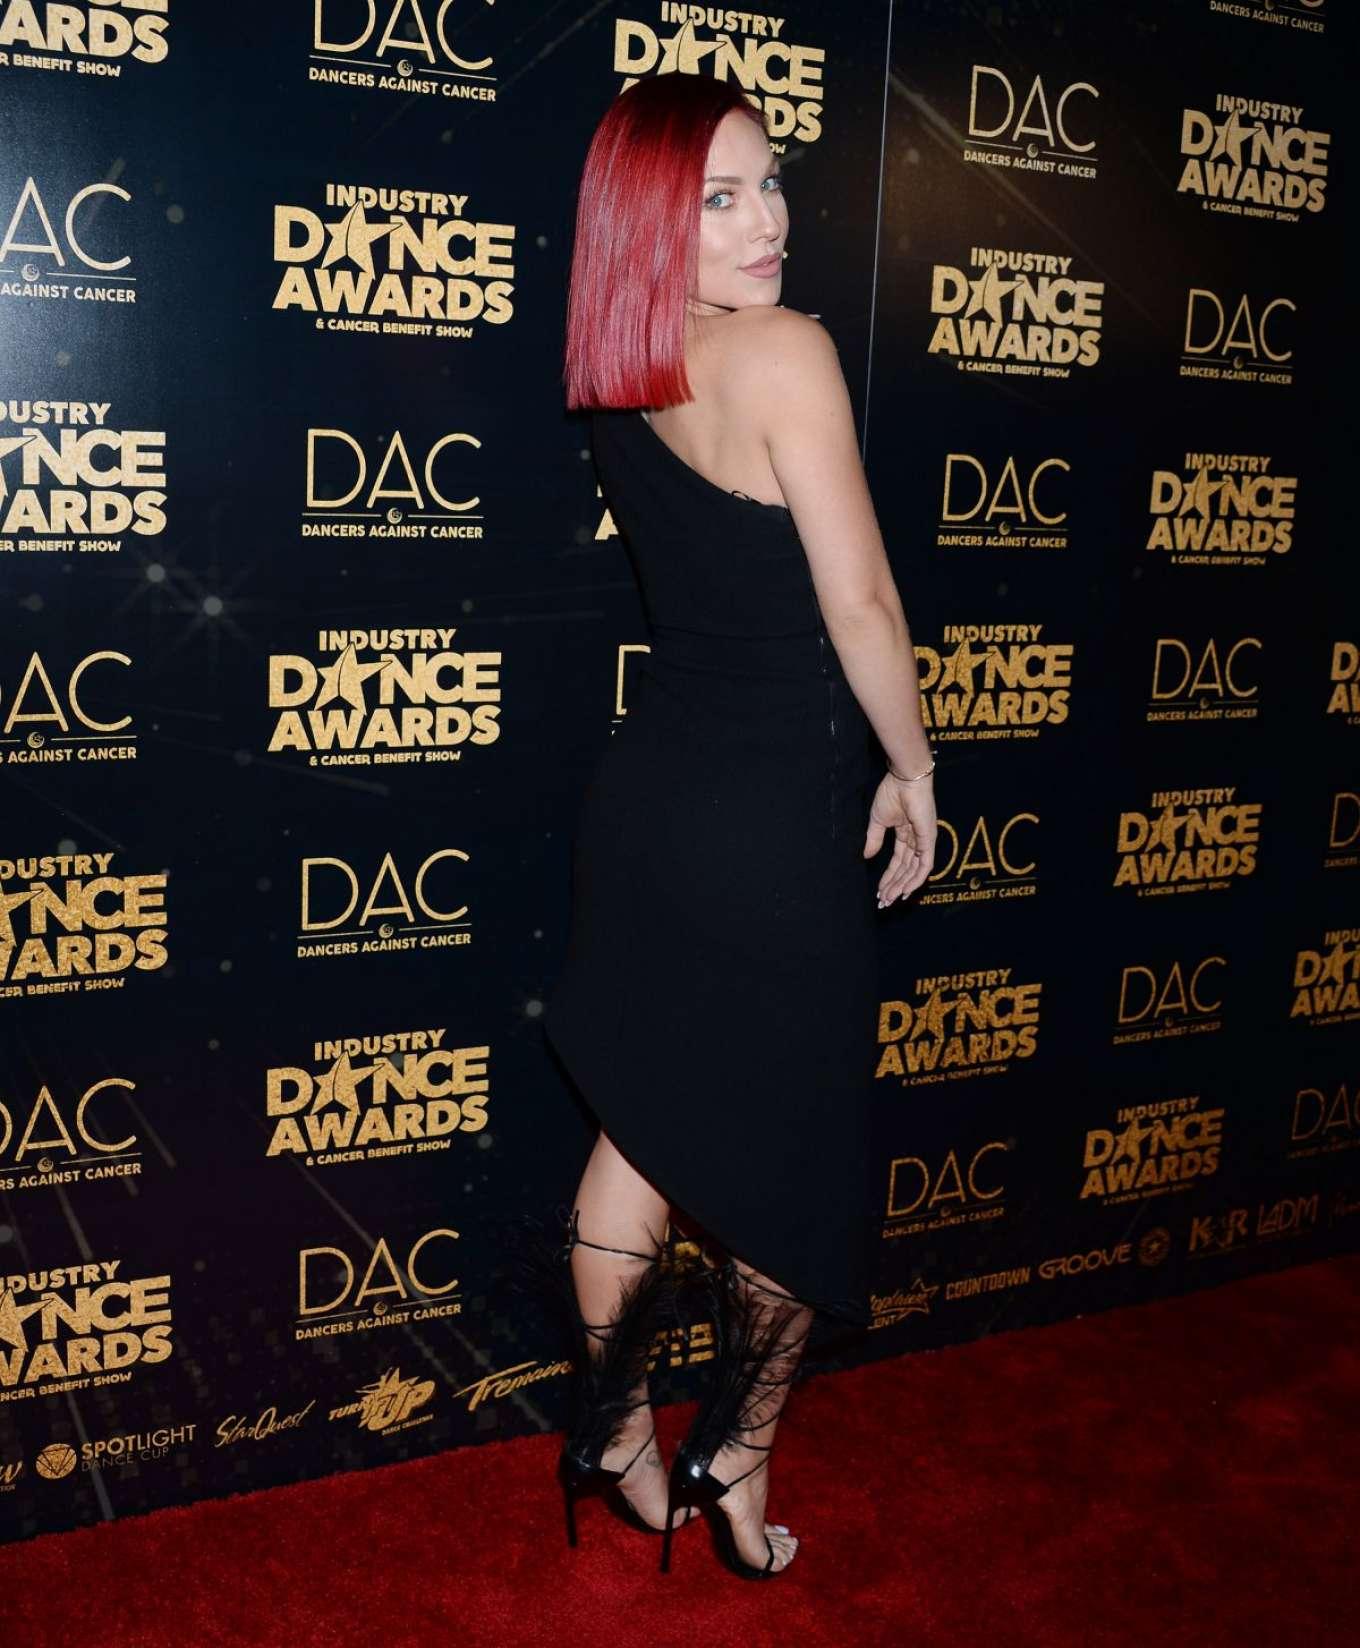 Sharna Burgess 2018 : Sharna Burgess: 2018 Industry Dance Awards -01